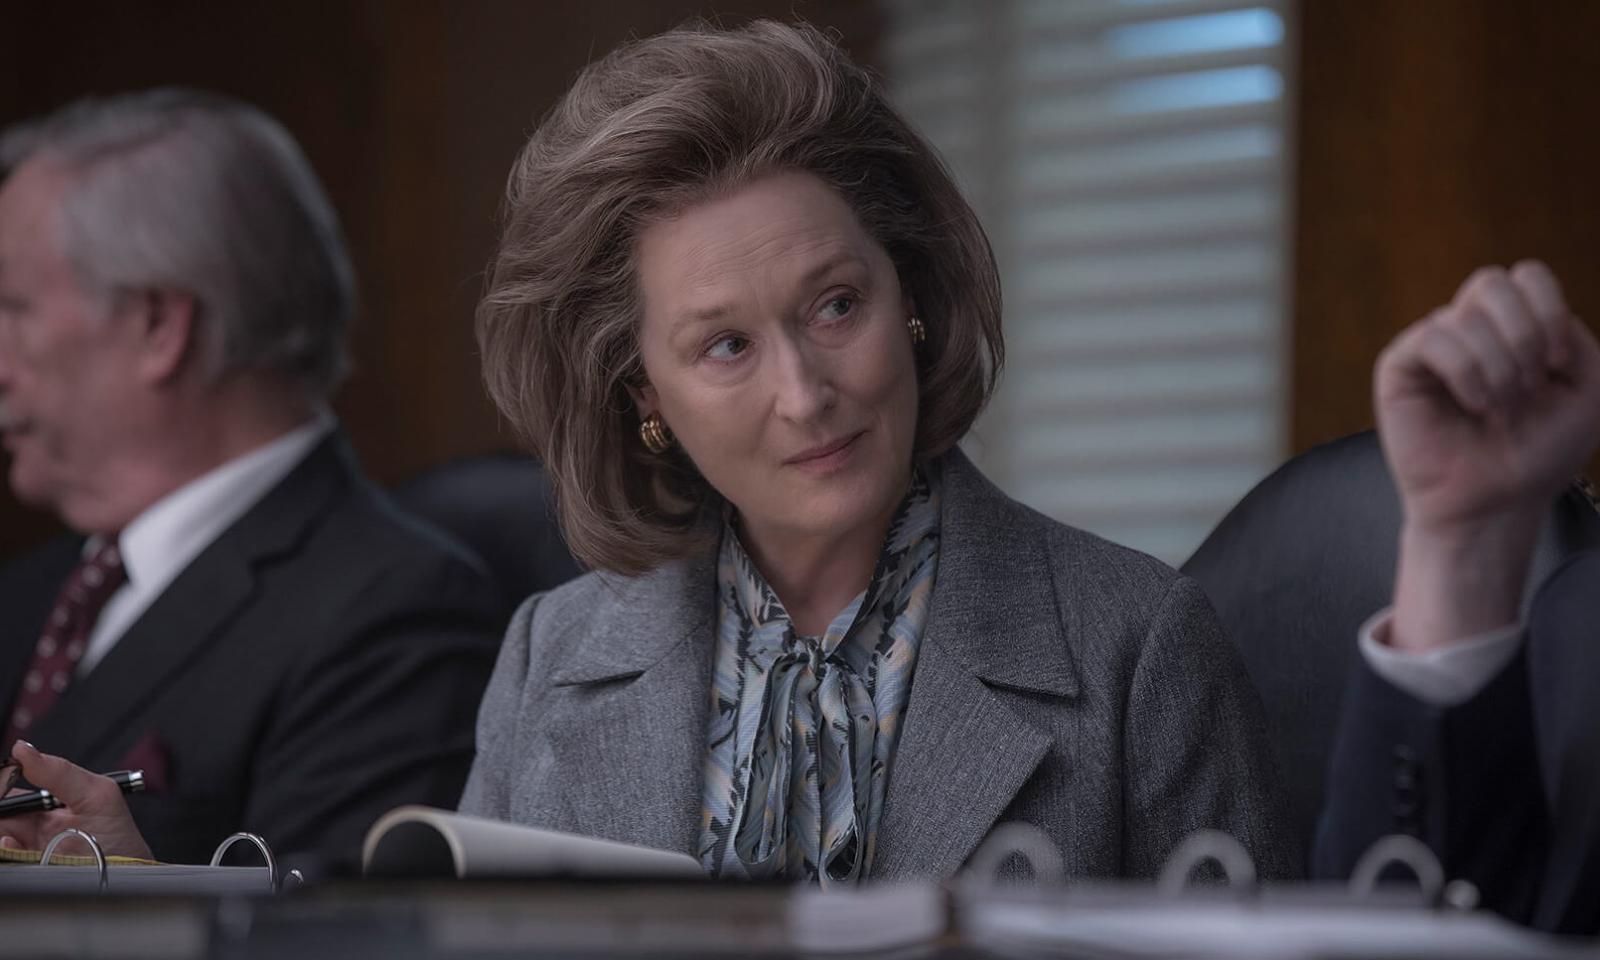 Meryl_Streep_The_Post.png